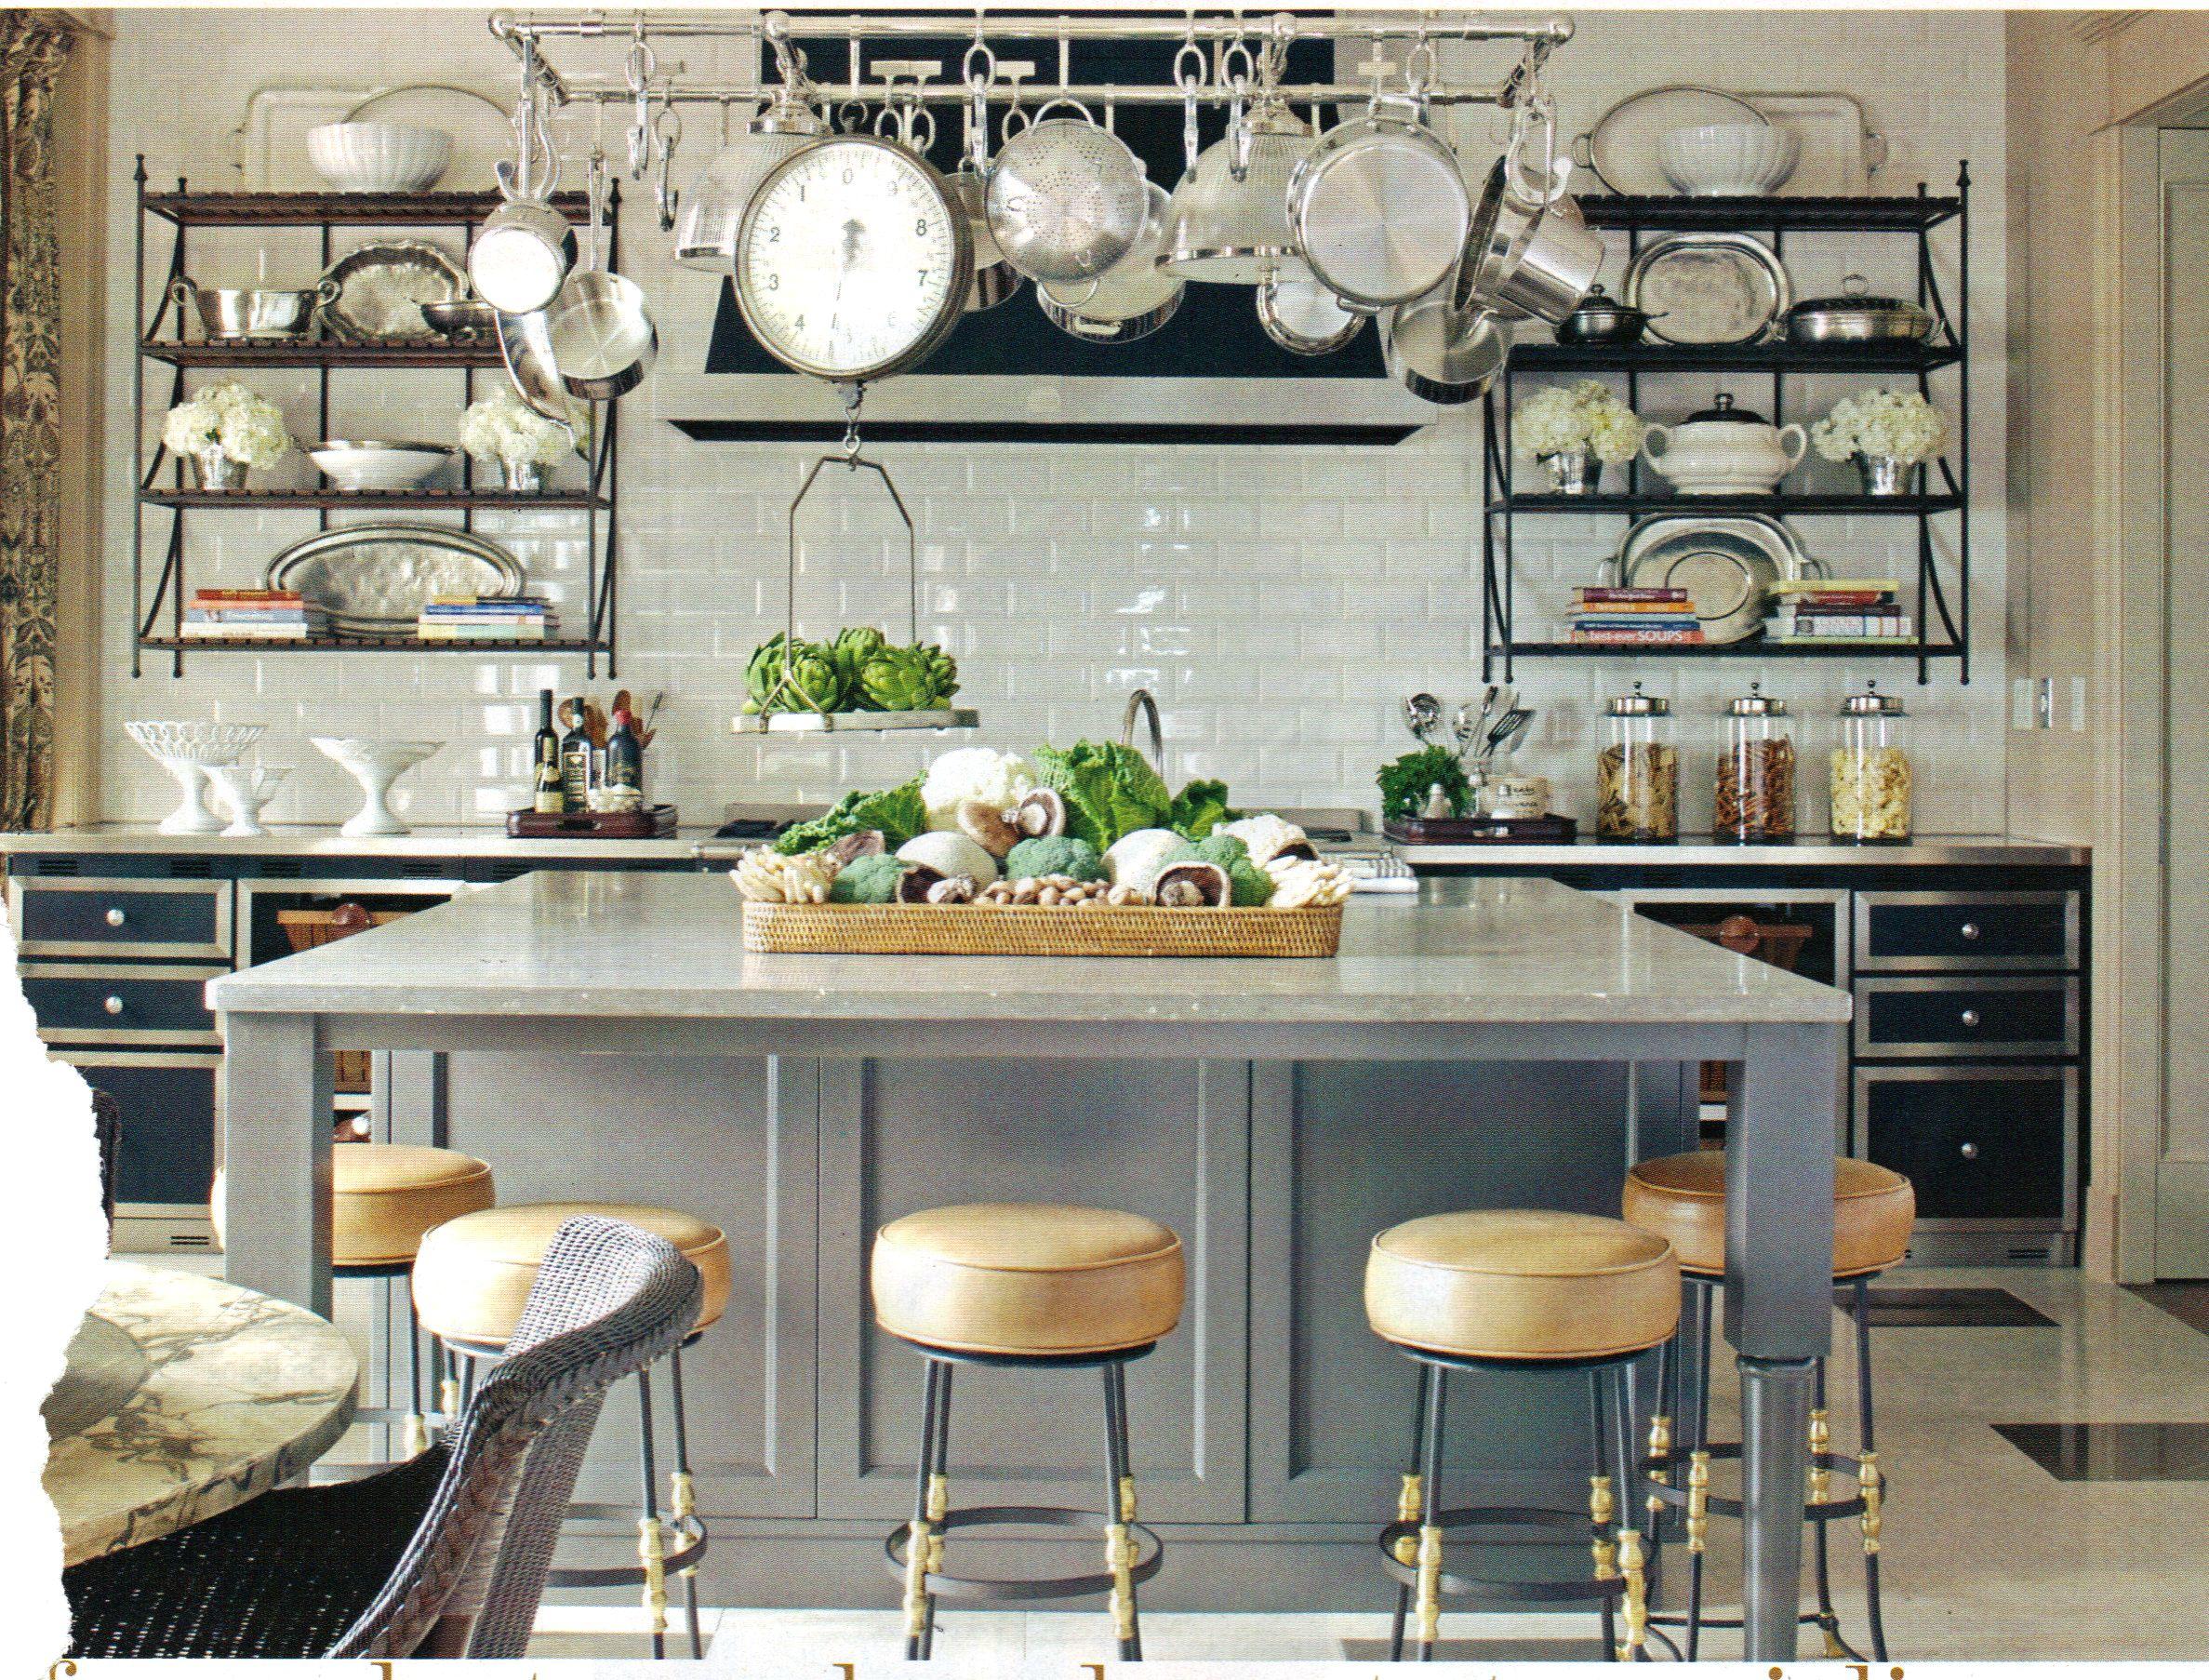 by kitchen designer Kathy Manzella originally published